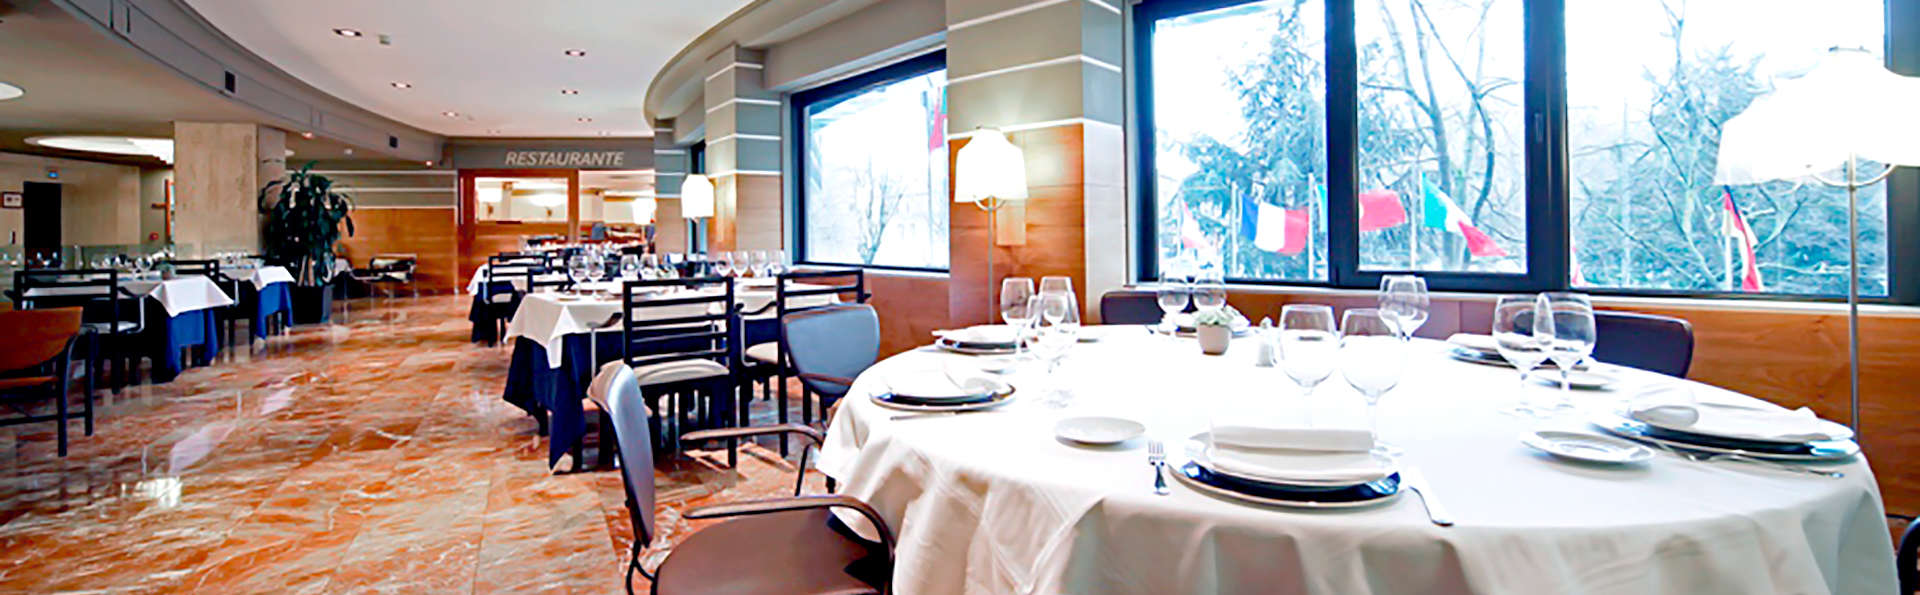 Hotel Tres Reyes  - Edit_Restaurant2.jpg